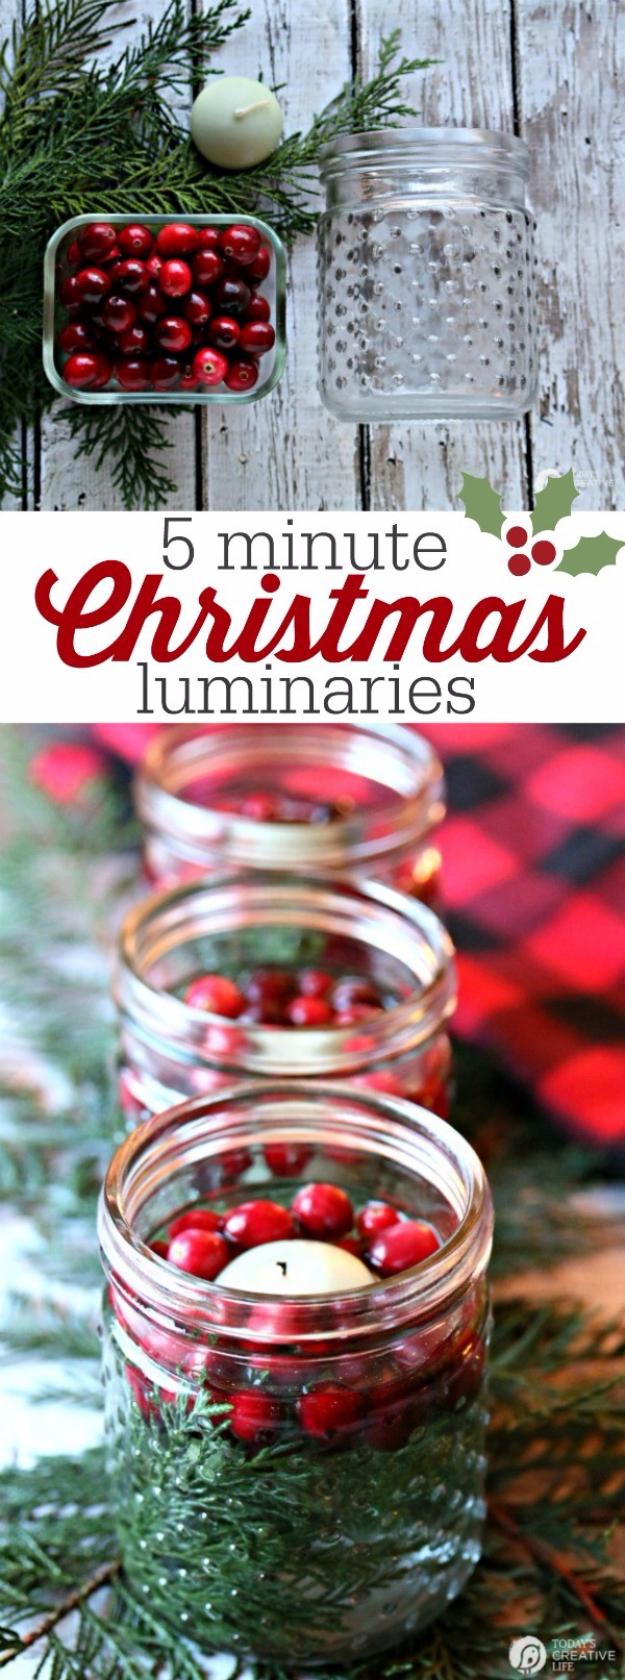 28 most beautiful christmas luminaries diy christmas luminaries and home decor for the holidays 5 minute christmas luminaries cool solutioingenieria Images